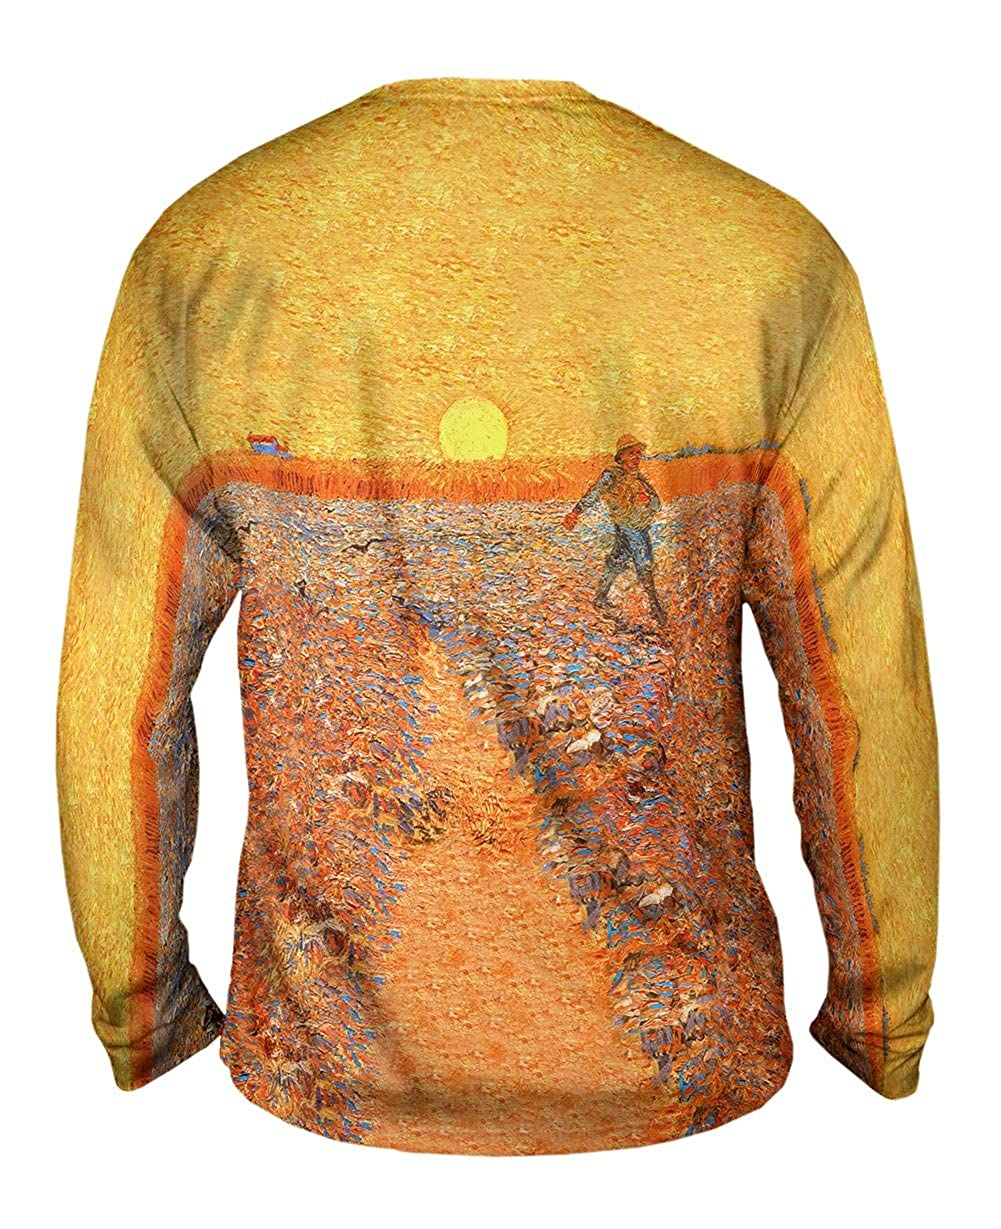 1888 -TShirt- Mens Long Sleeve Yizzam- Vincent van Gogh The Sower